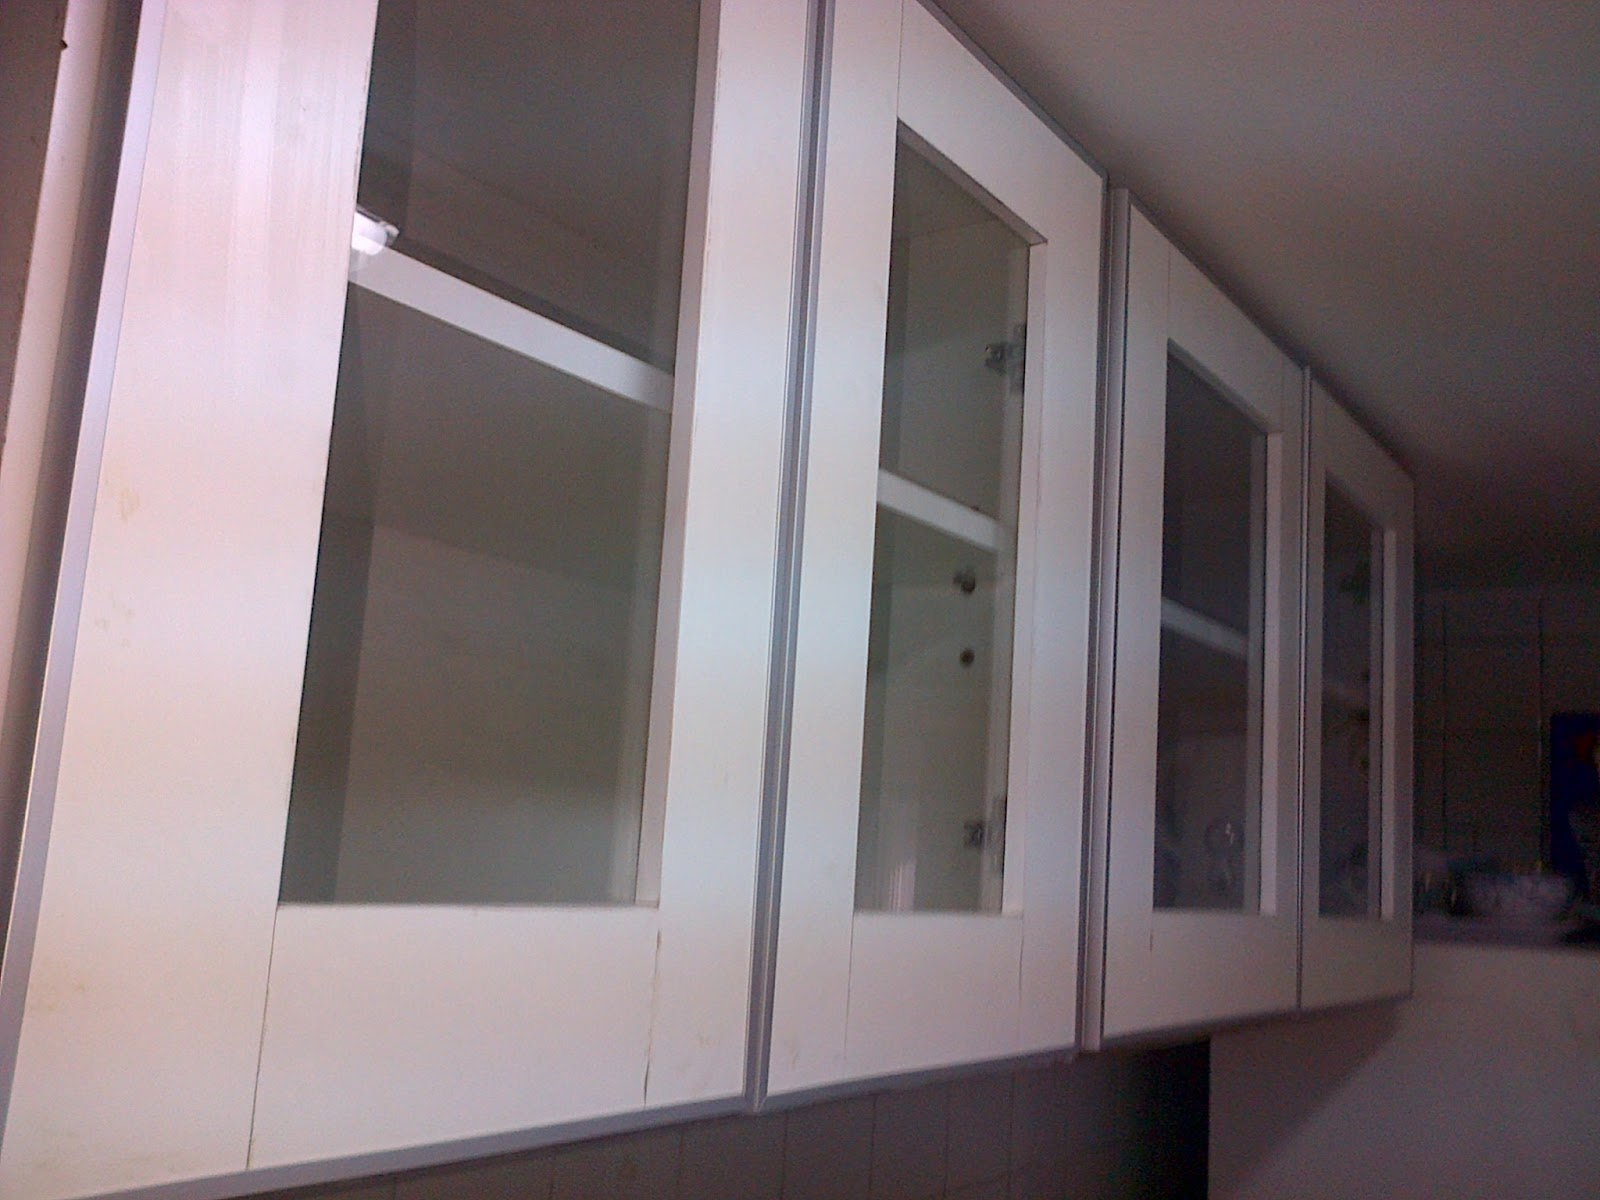 Tapa carpintero muebles de cocina for Muebles colgantes para cocina